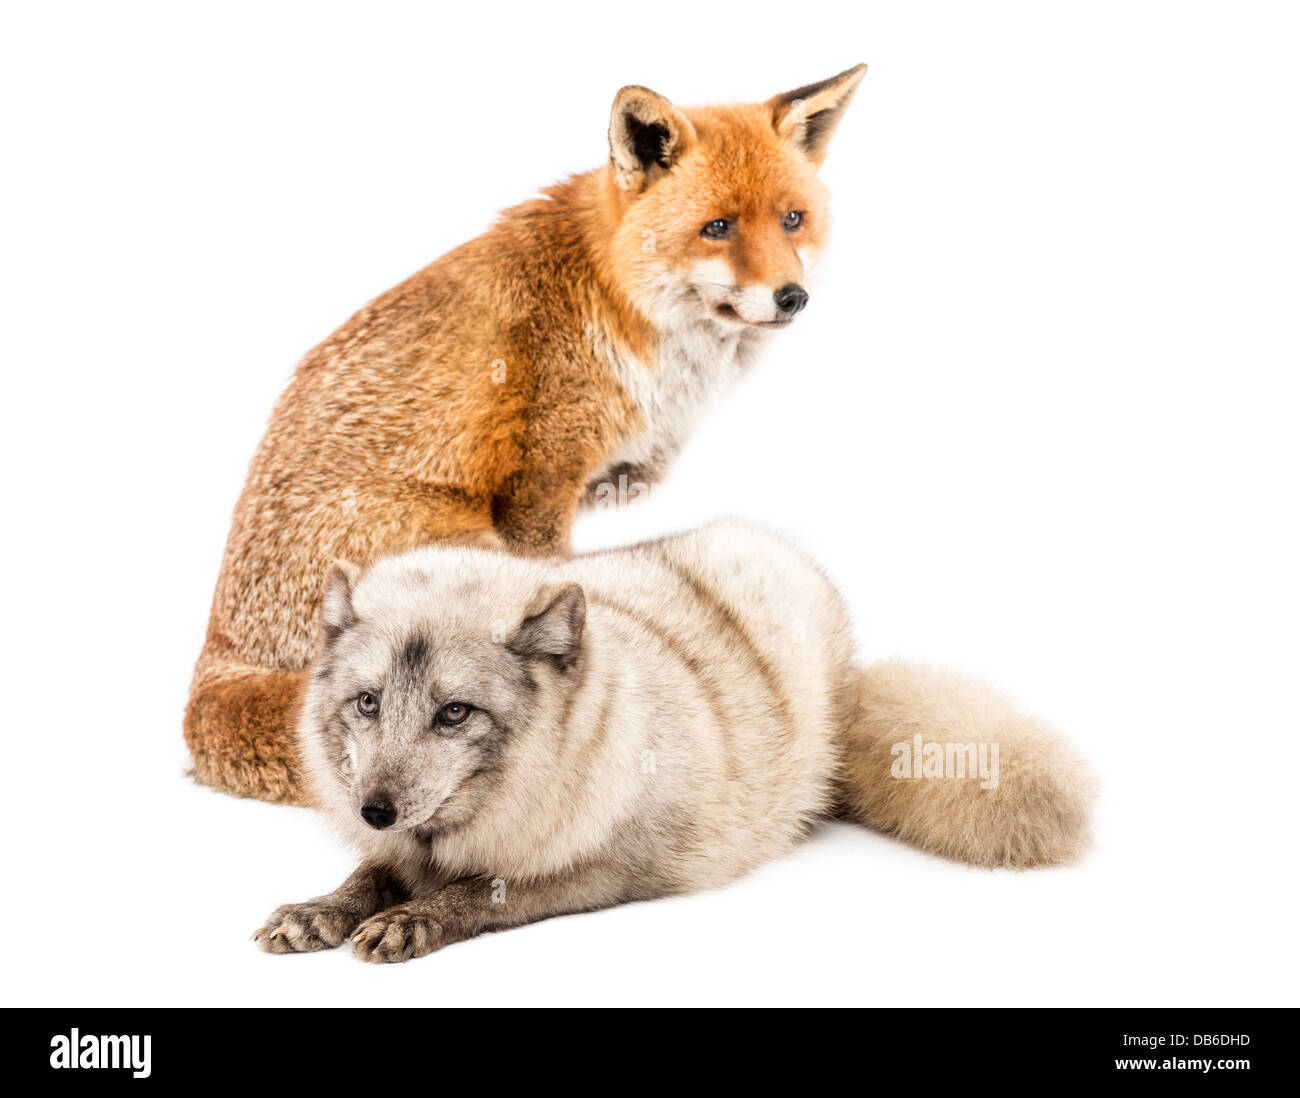 Red Fox Vulpes Vulpes Seduta Accanto Alla Volpe Artica Vulpes